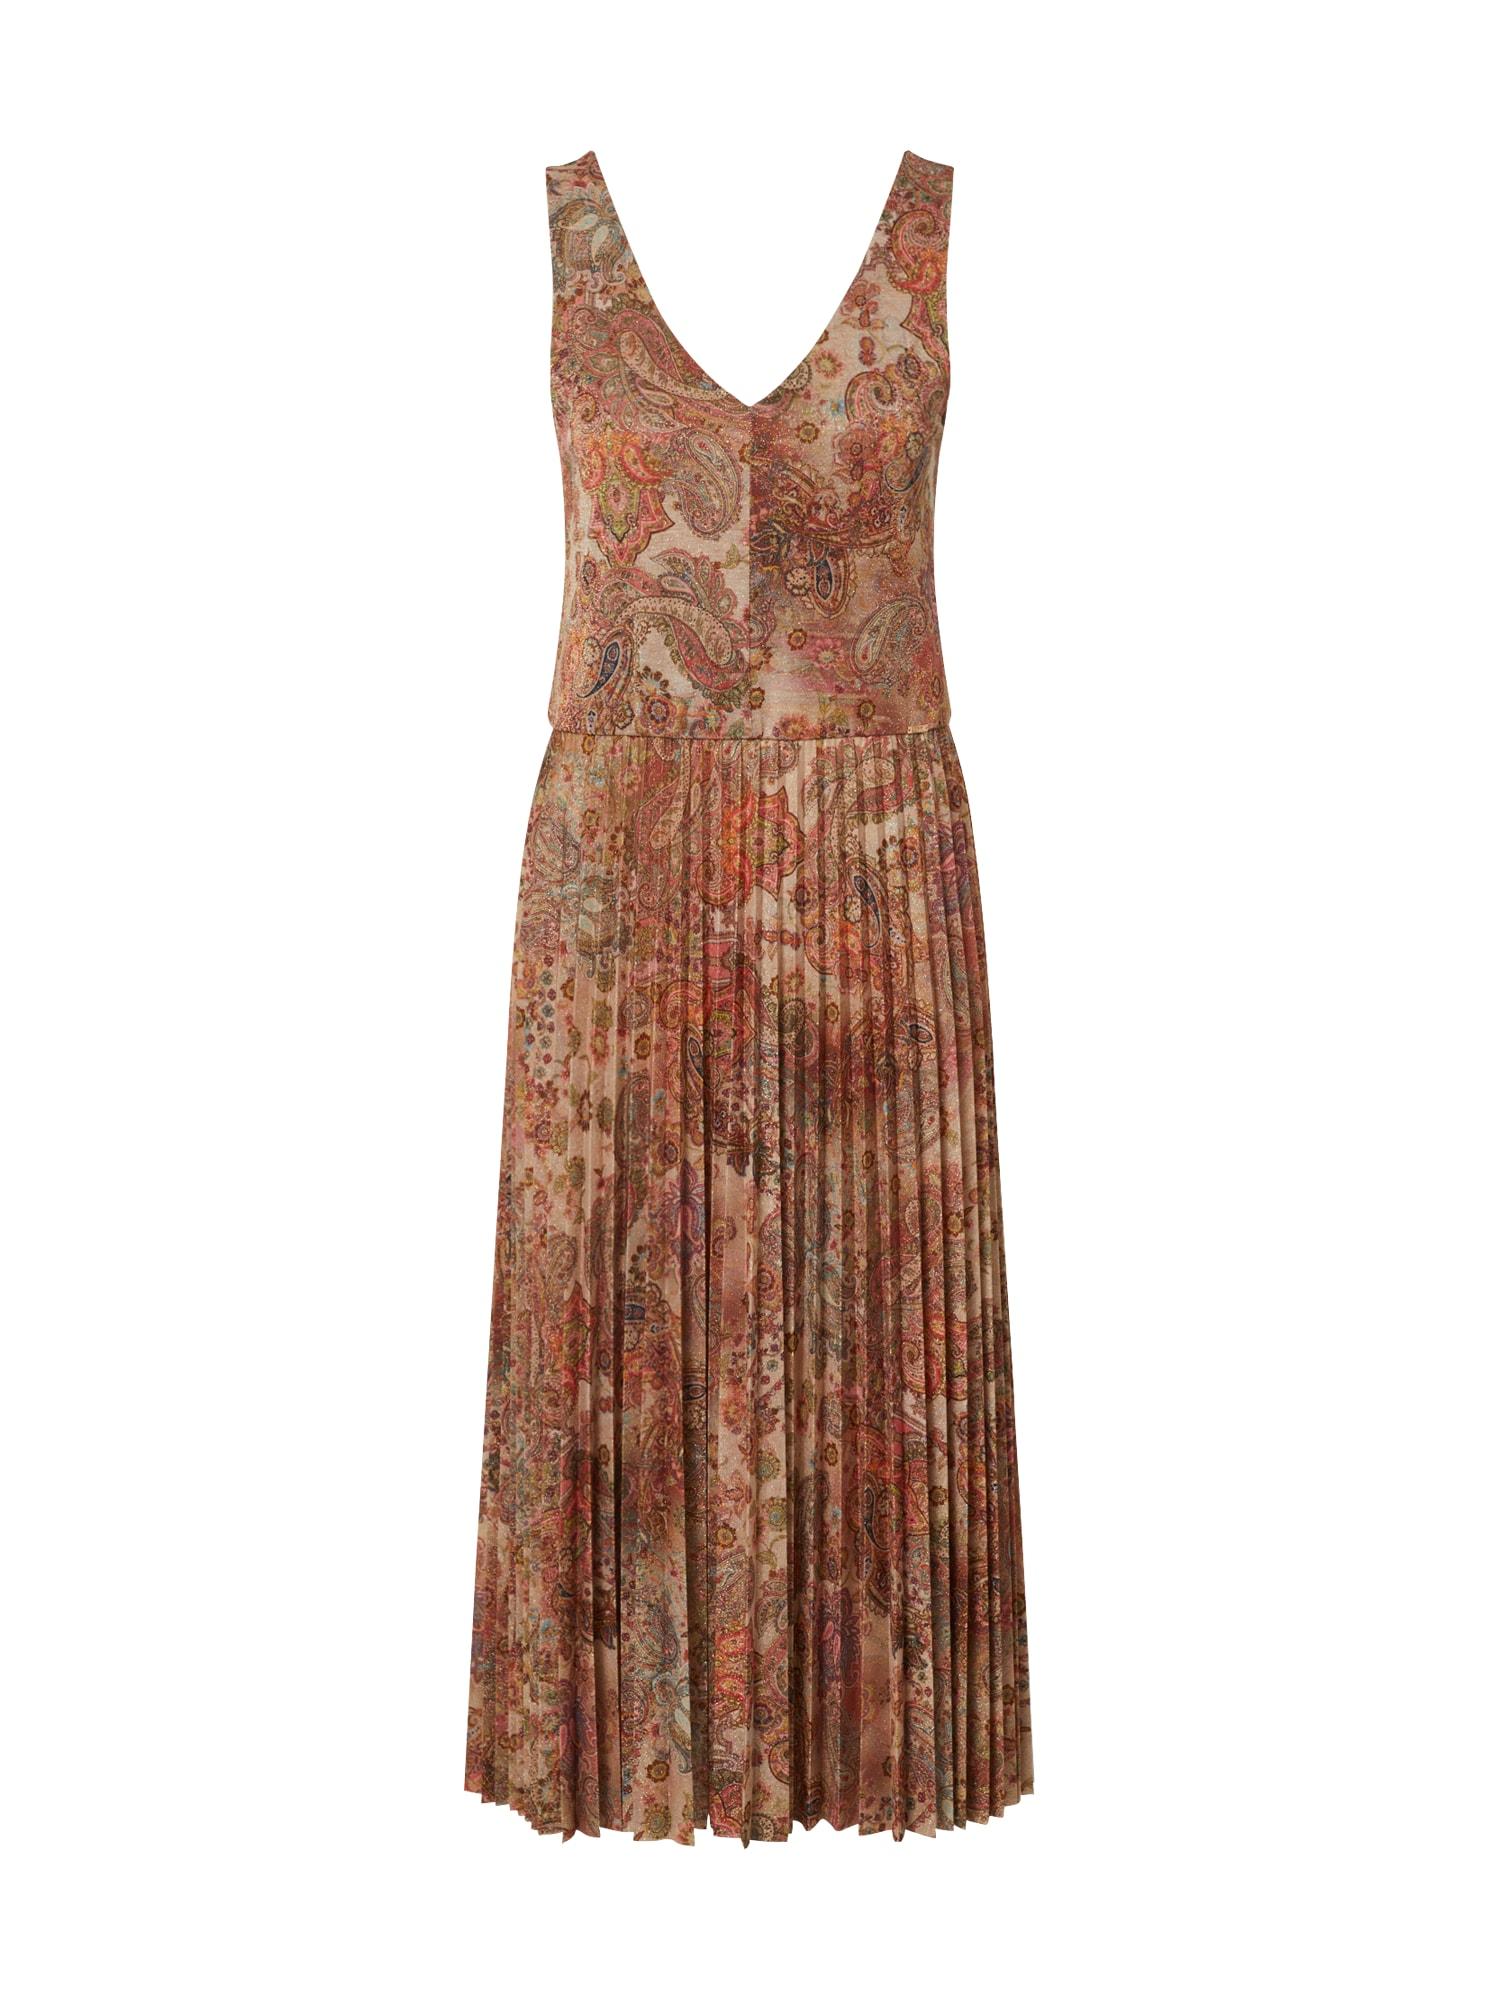 CINQUE Suknelė 'FALDA' mišrios spalvos / rožių spalva